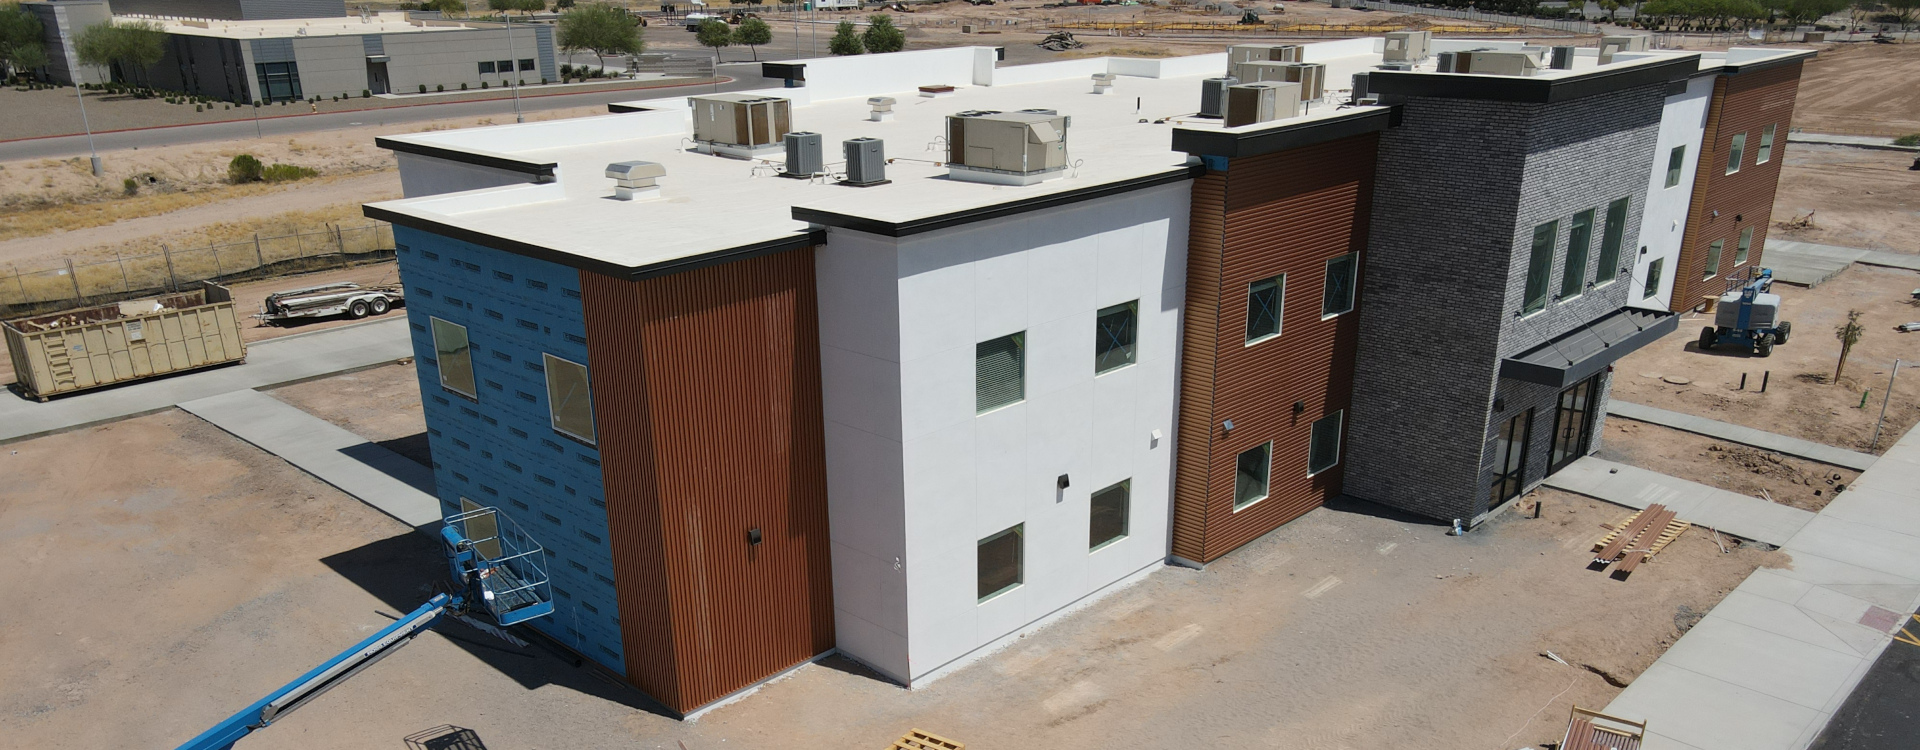 Maricopa Arizona Come Build A City With Us Business View Magazine